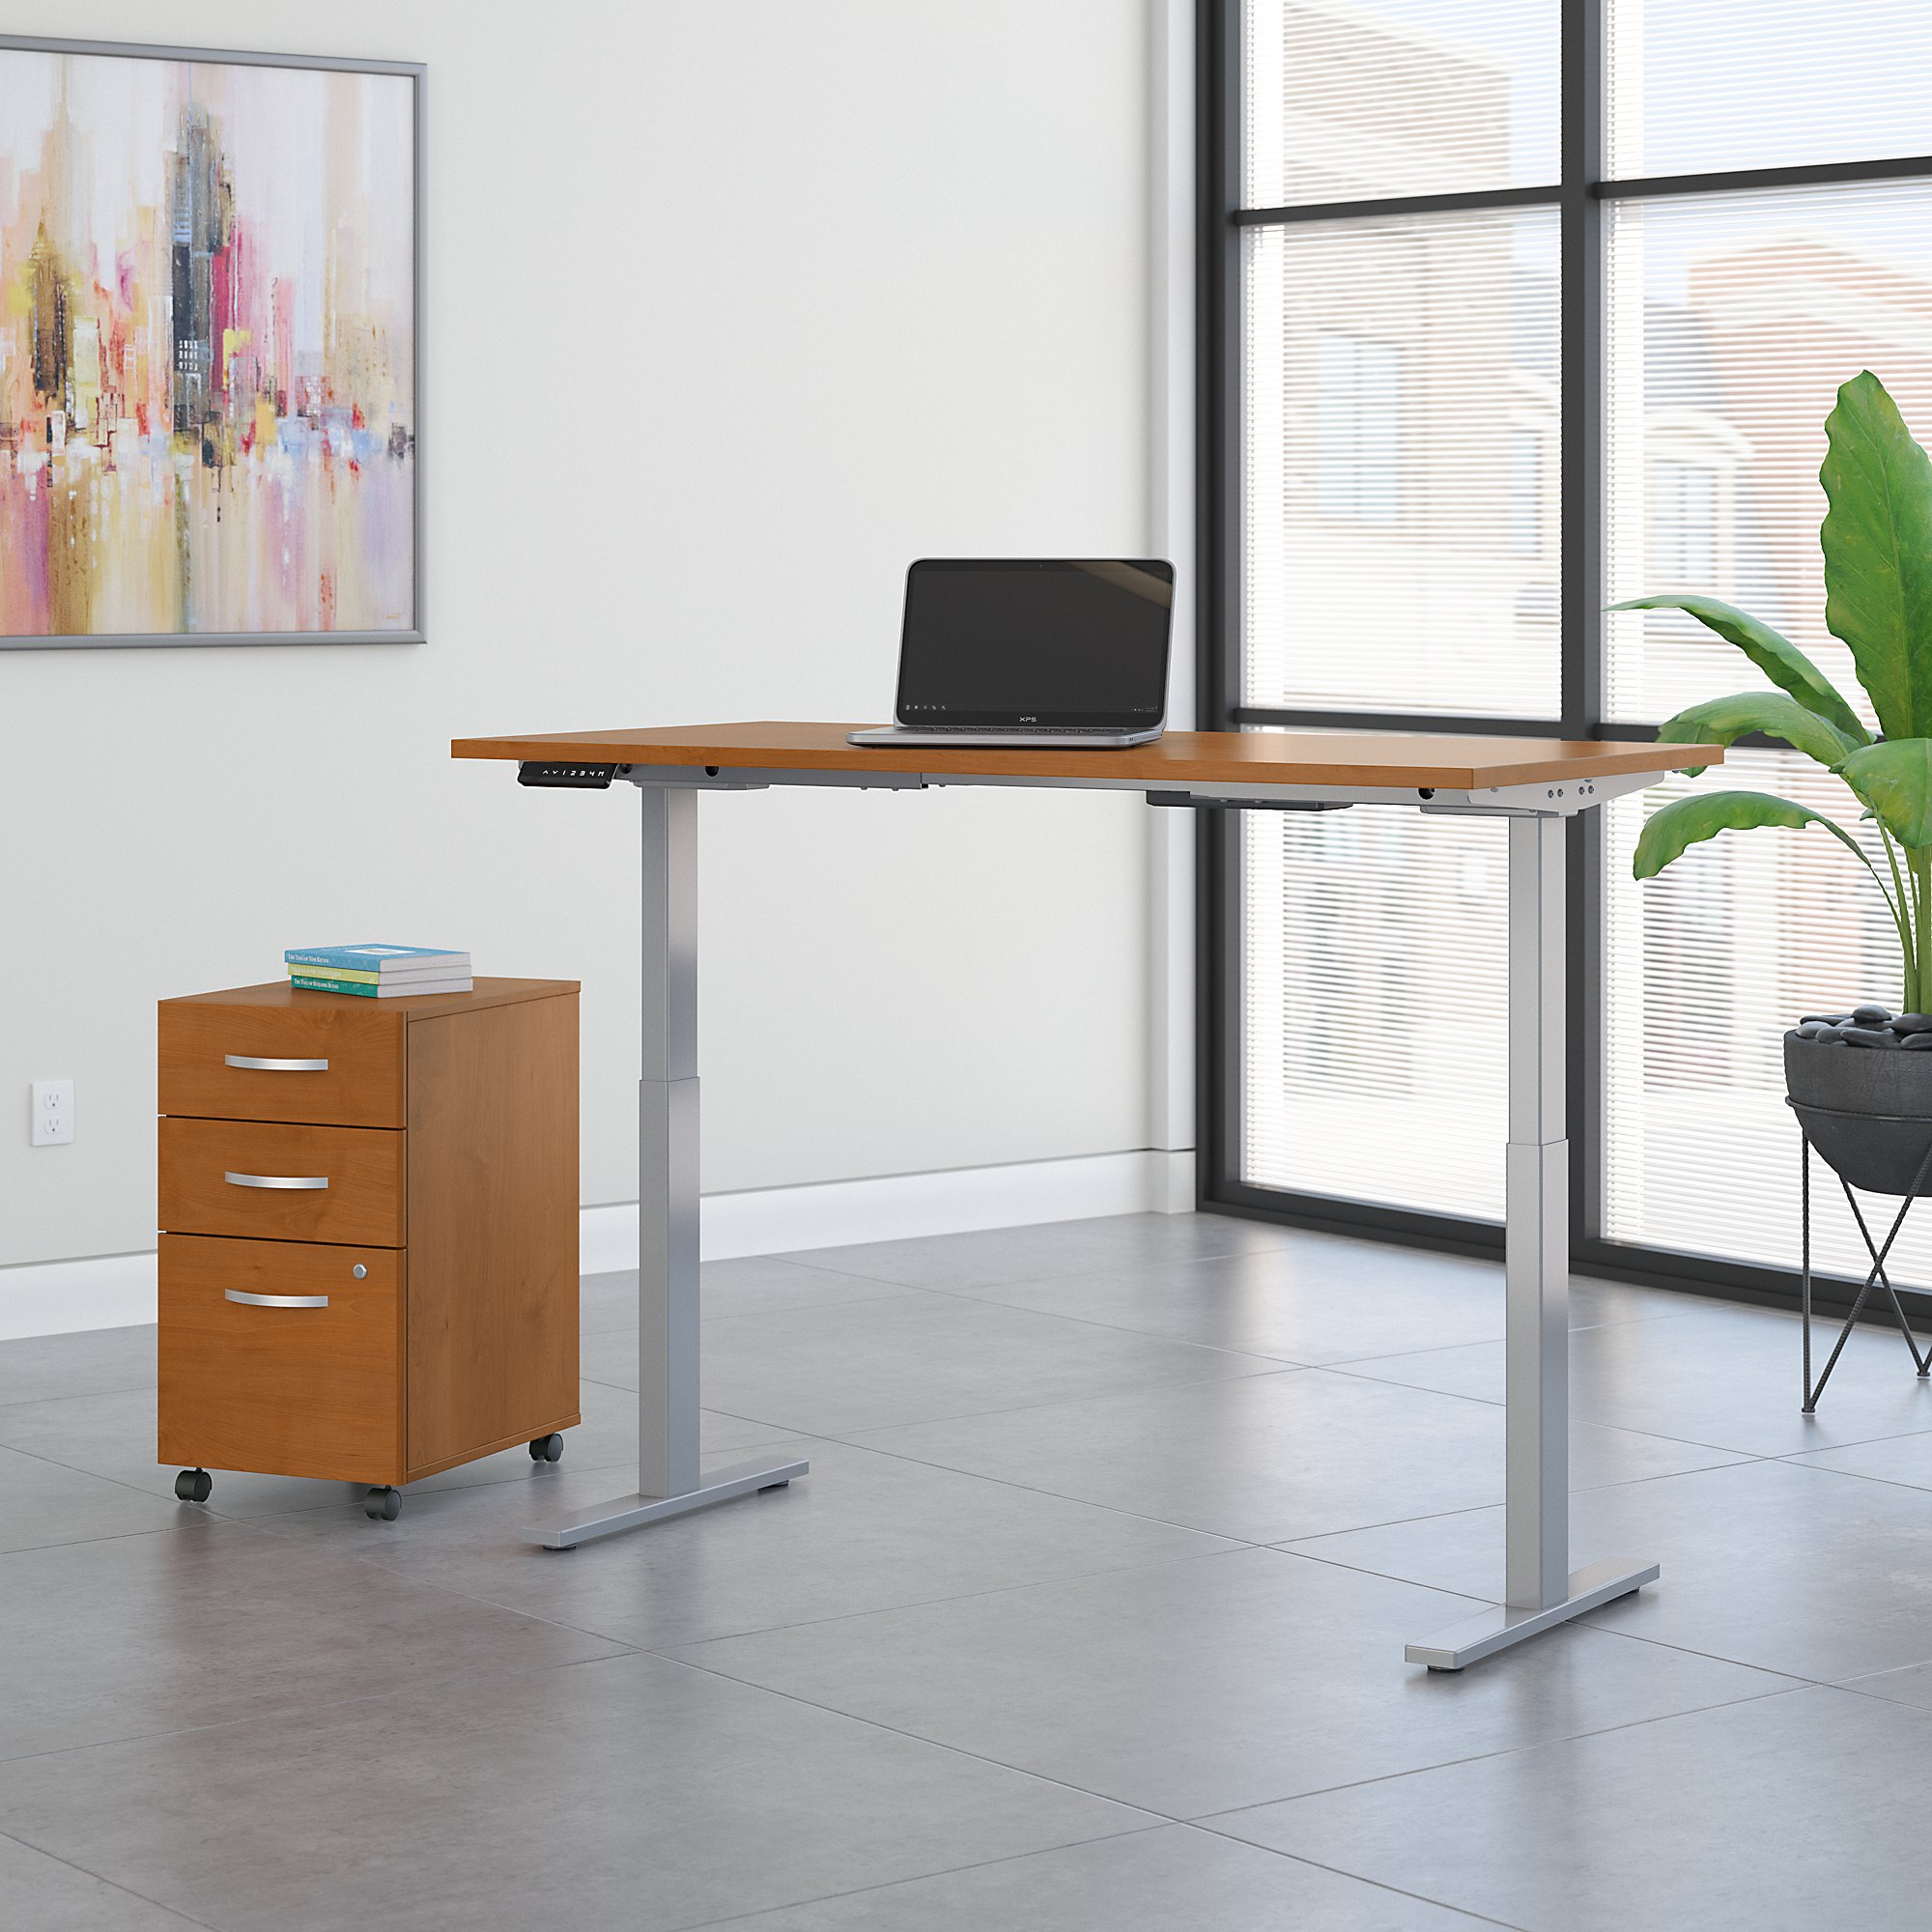 hansen cherry 72x30 ergonomic desk with file